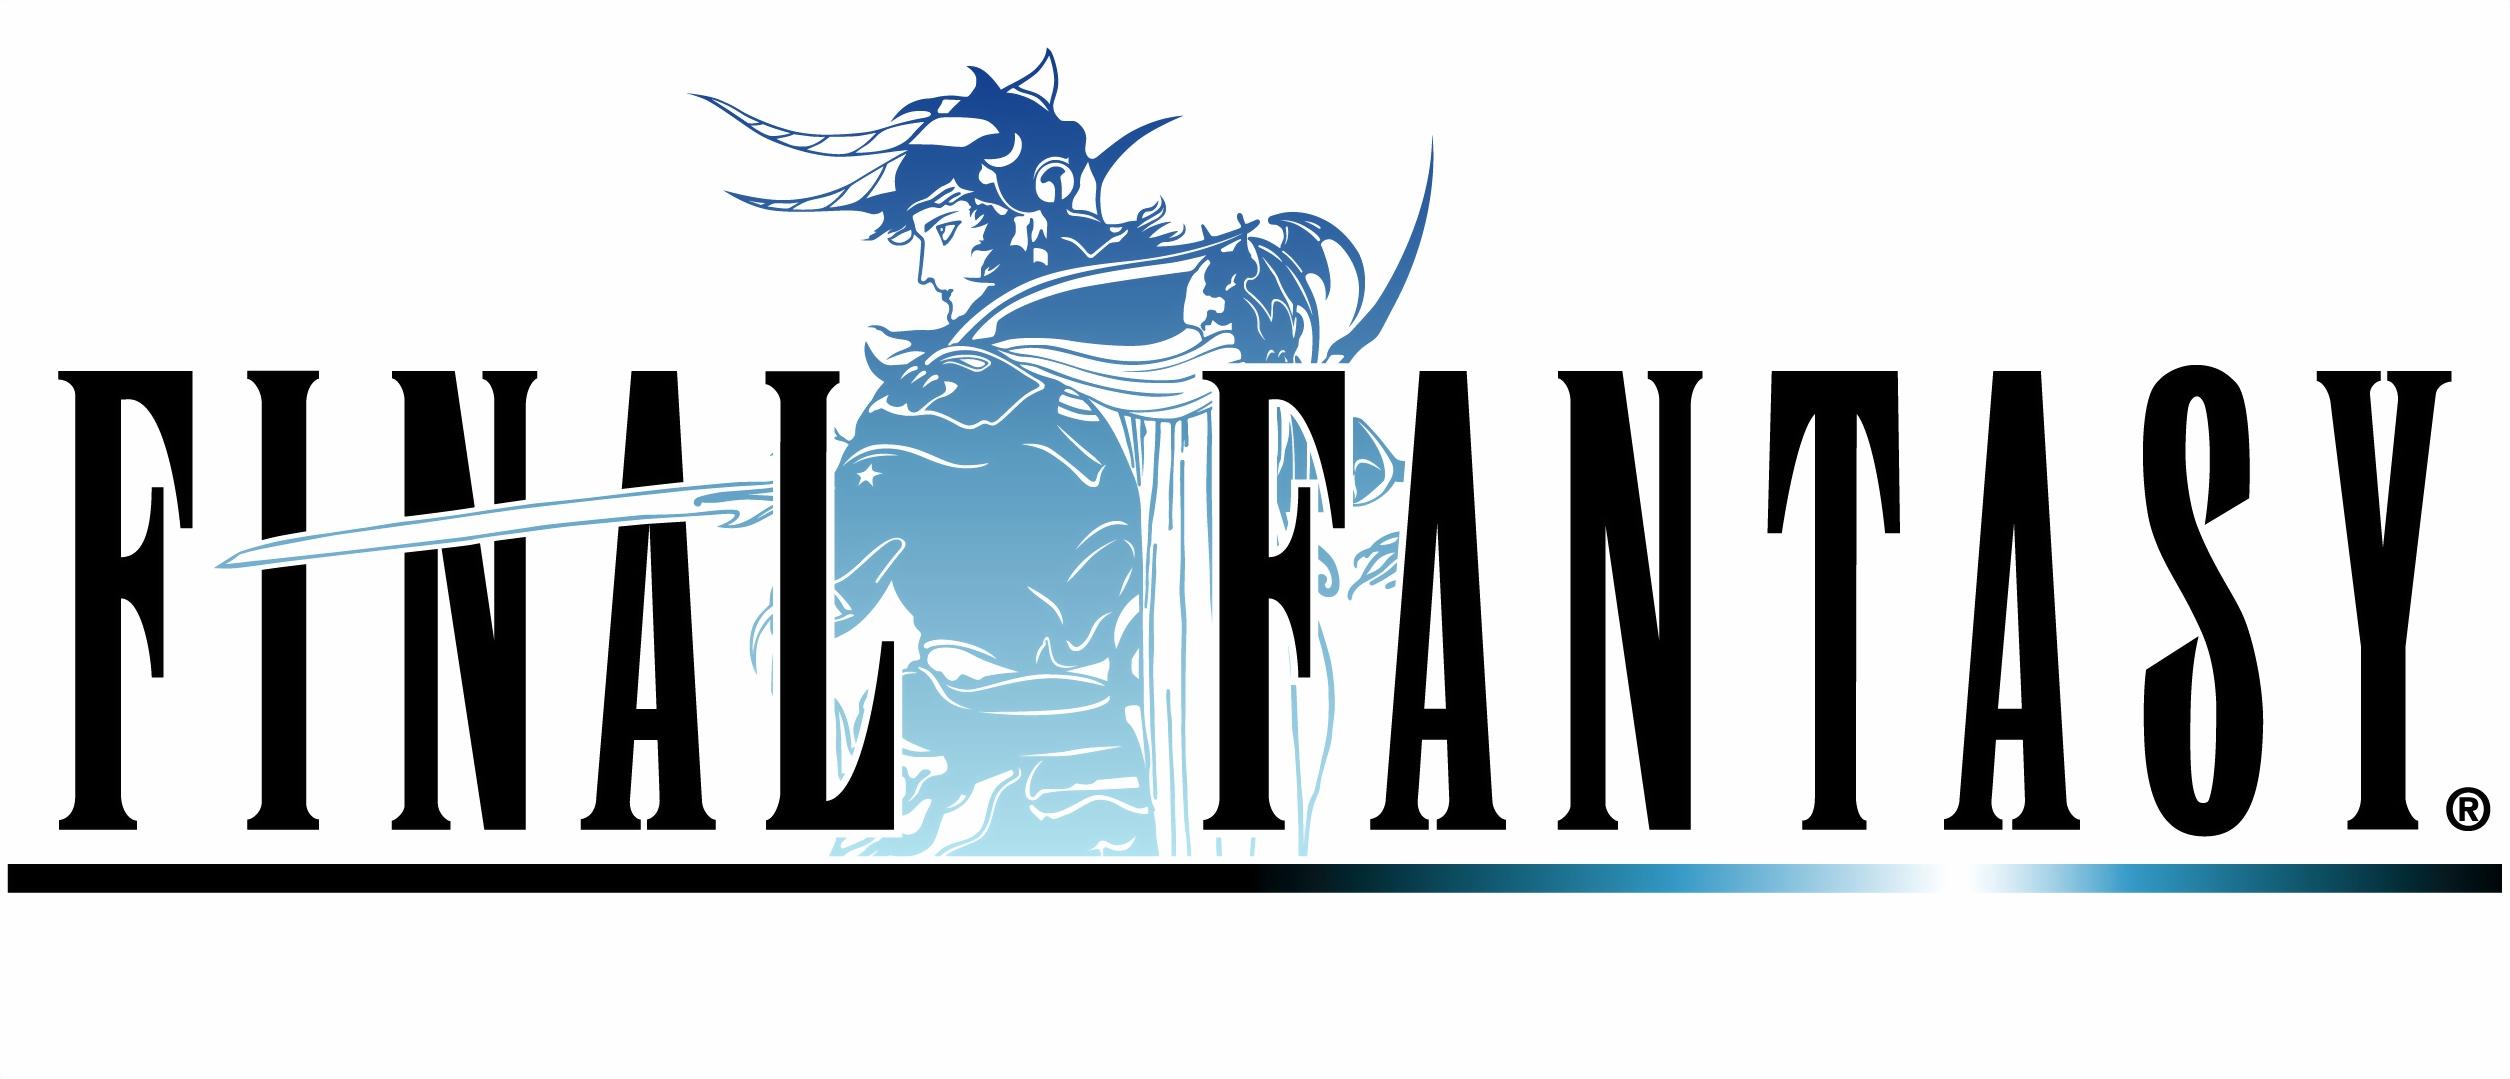 Файл:Final Fantasy logo.jpg